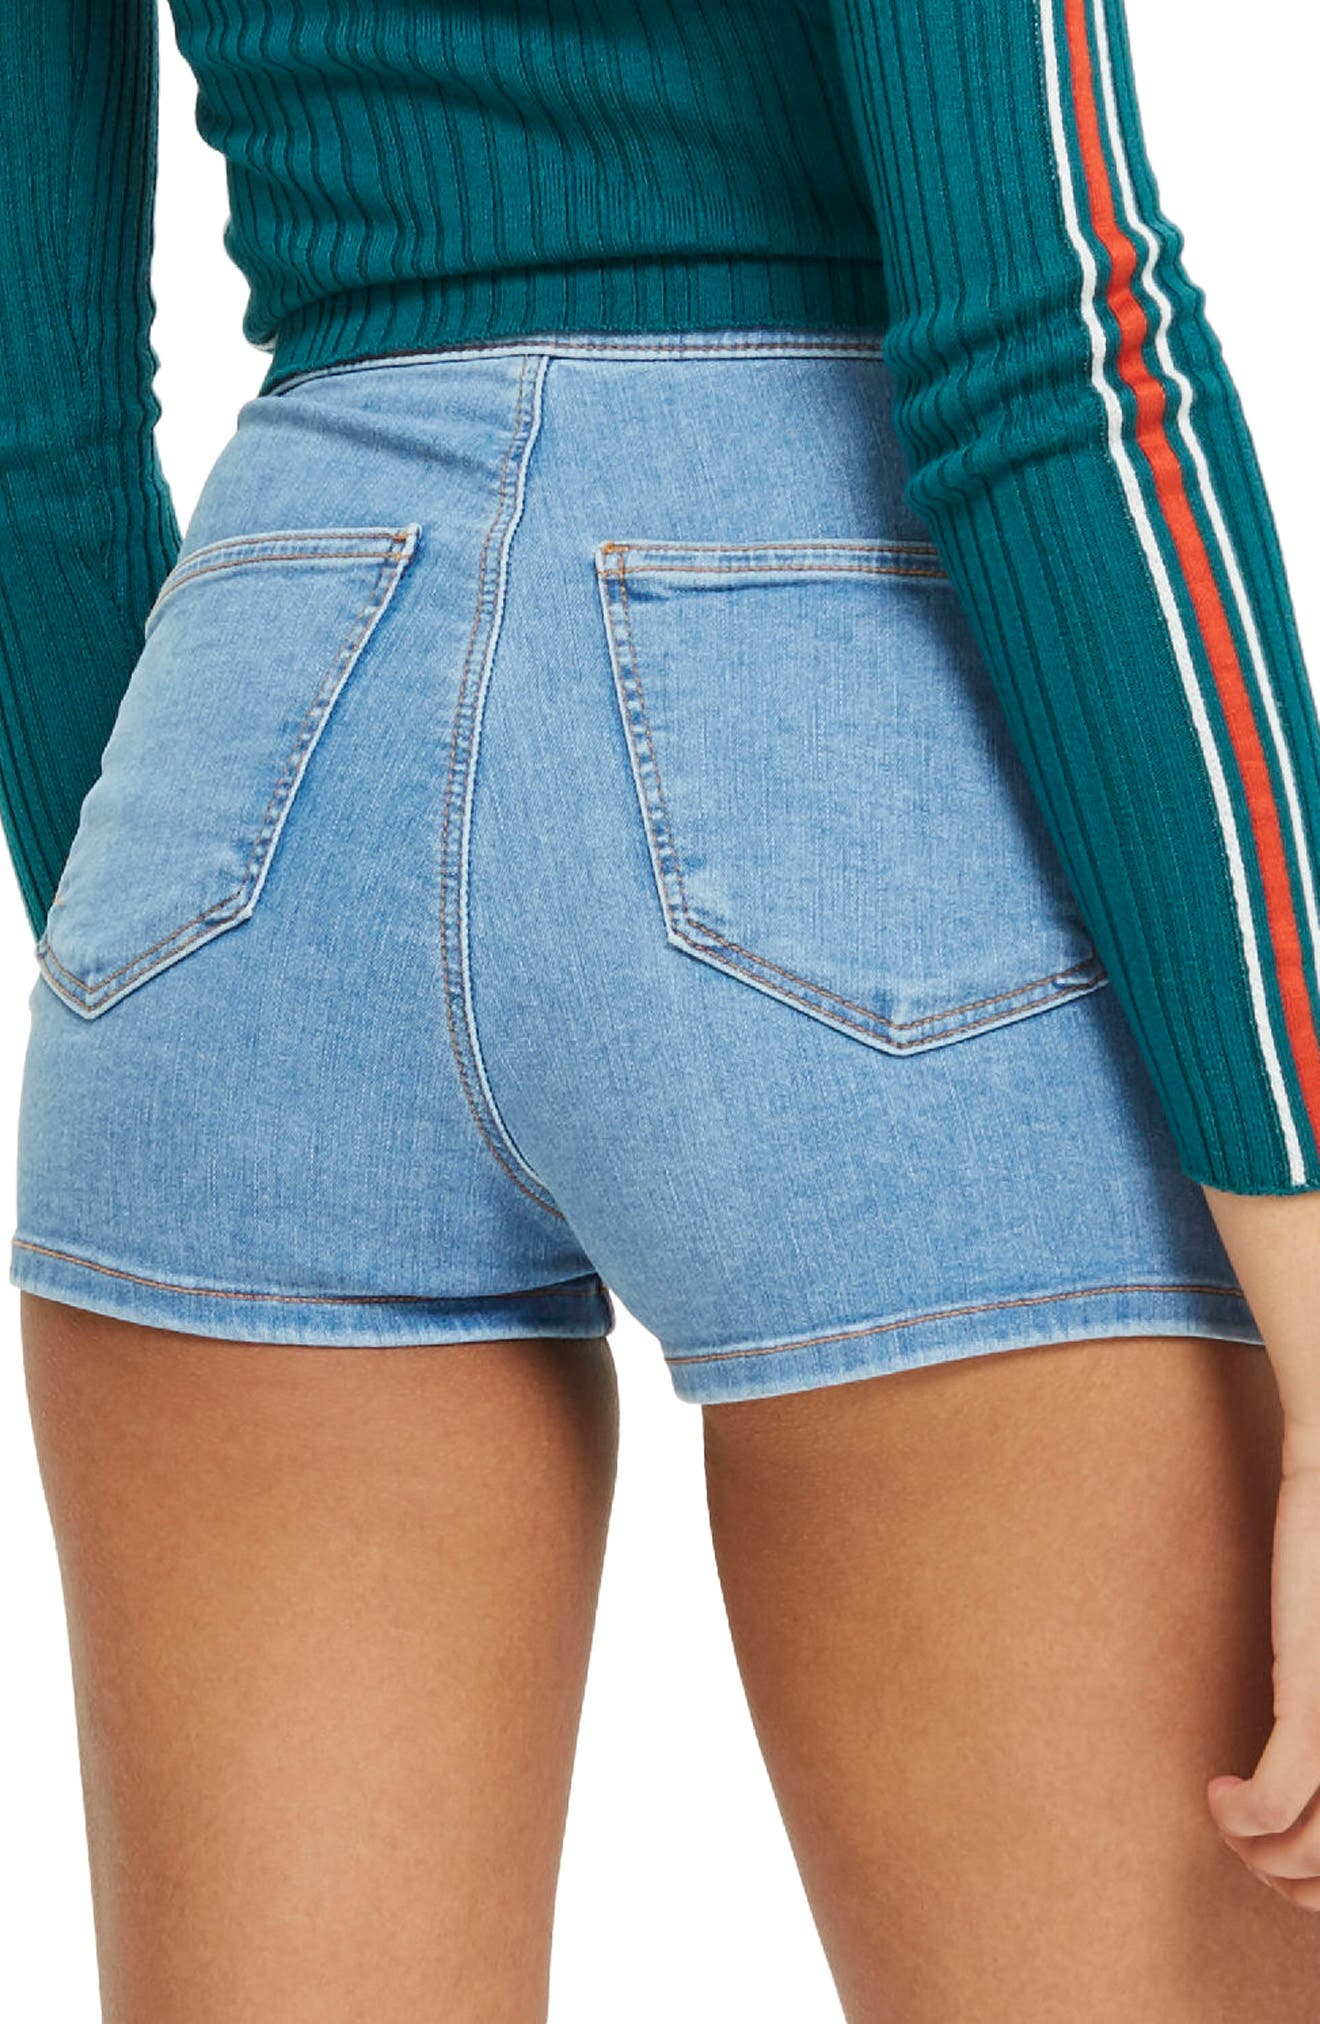 Joni Light Denim High Waist Shorts,                             Alternate thumbnail 2, color,                             450